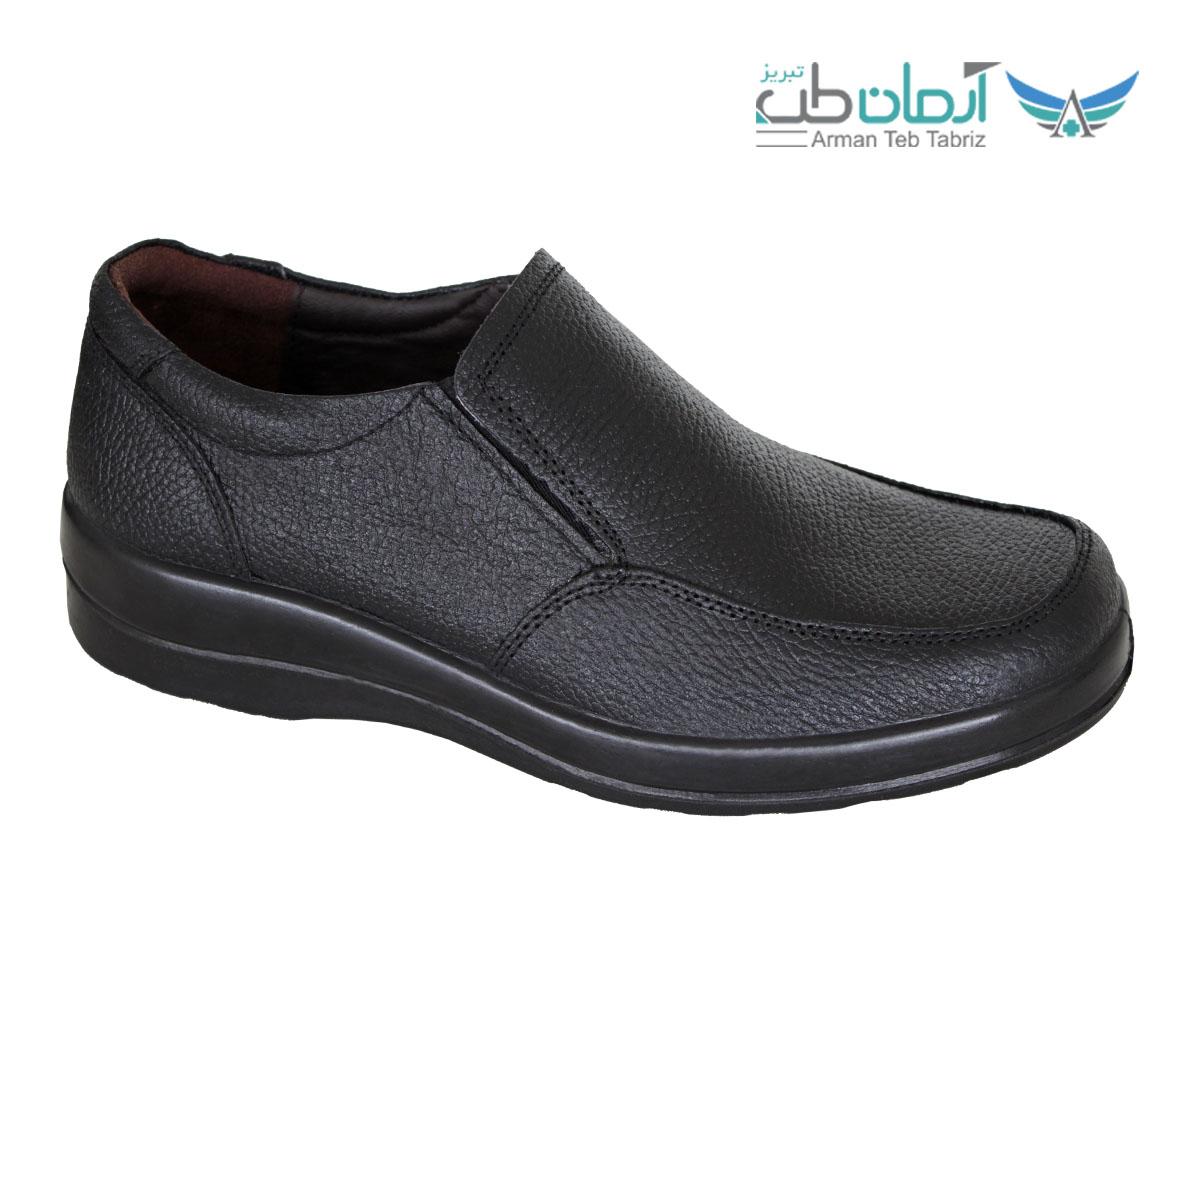 کفش مردانه پرسنلی اشبالت